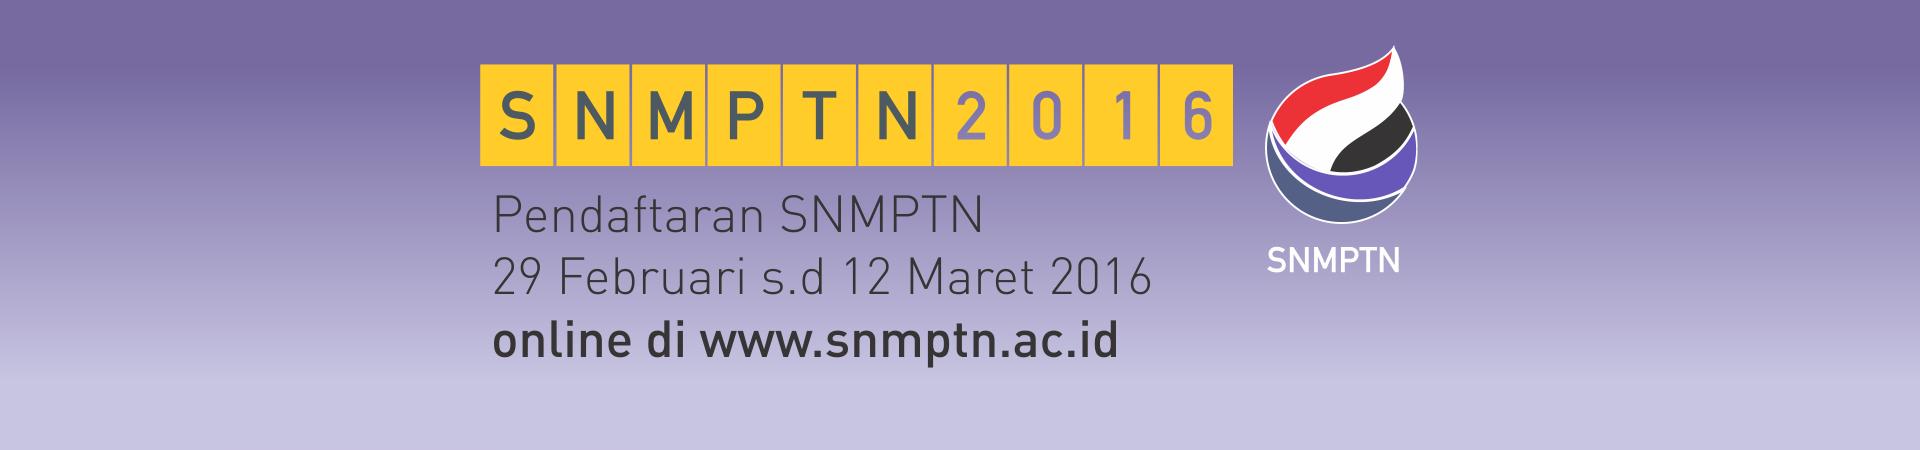 web-banner-snmptn-2016